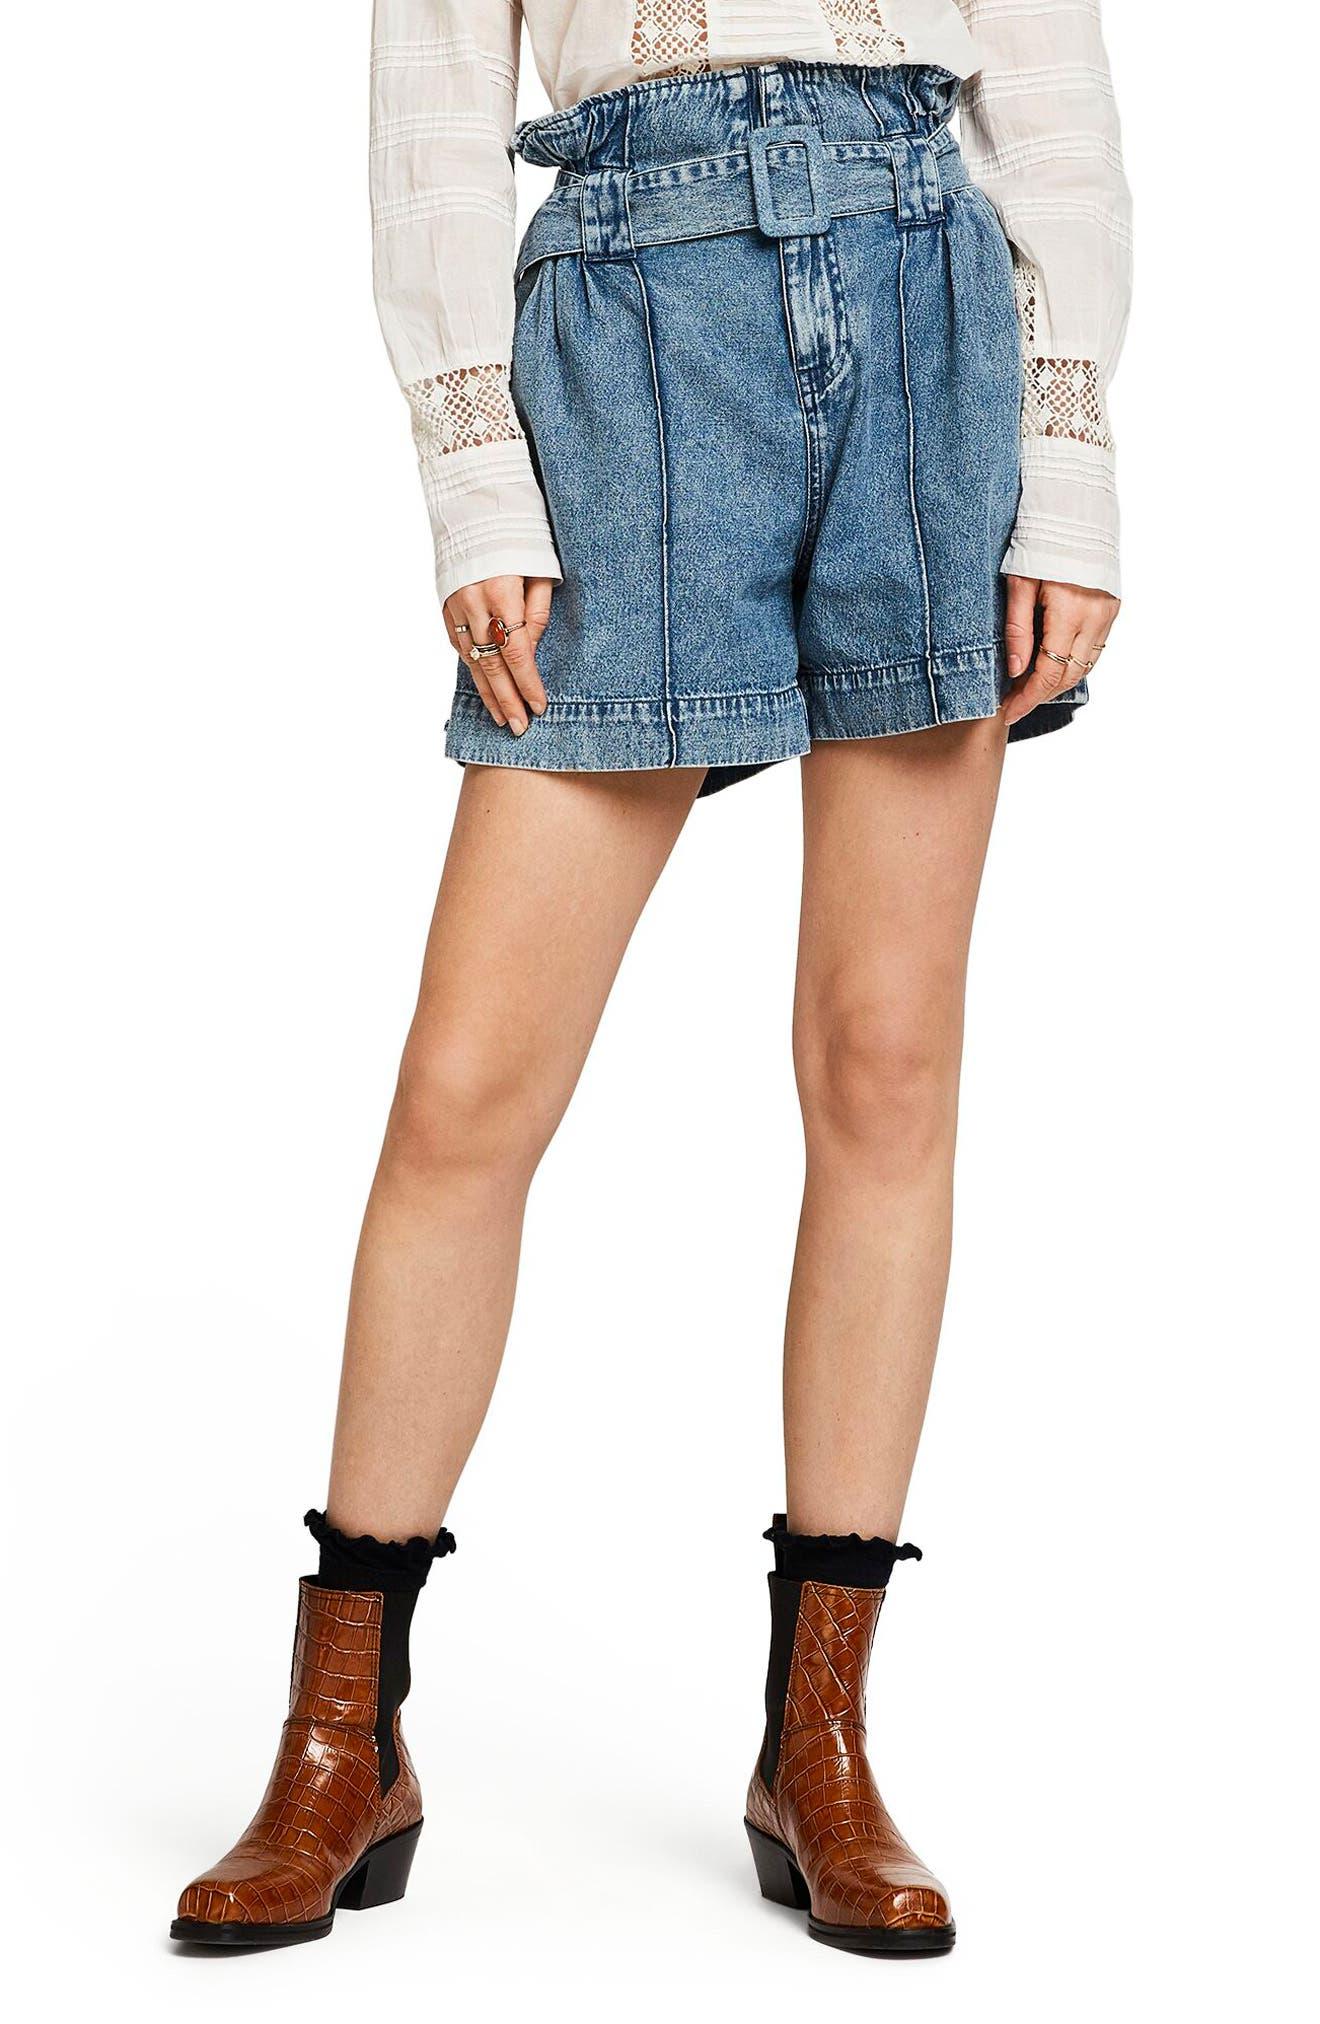 Vintage Shorts, Culottes,  Capris History Womens Scotch  Soda High Paperbag Waist Denim Shorts $145.00 AT vintagedancer.com